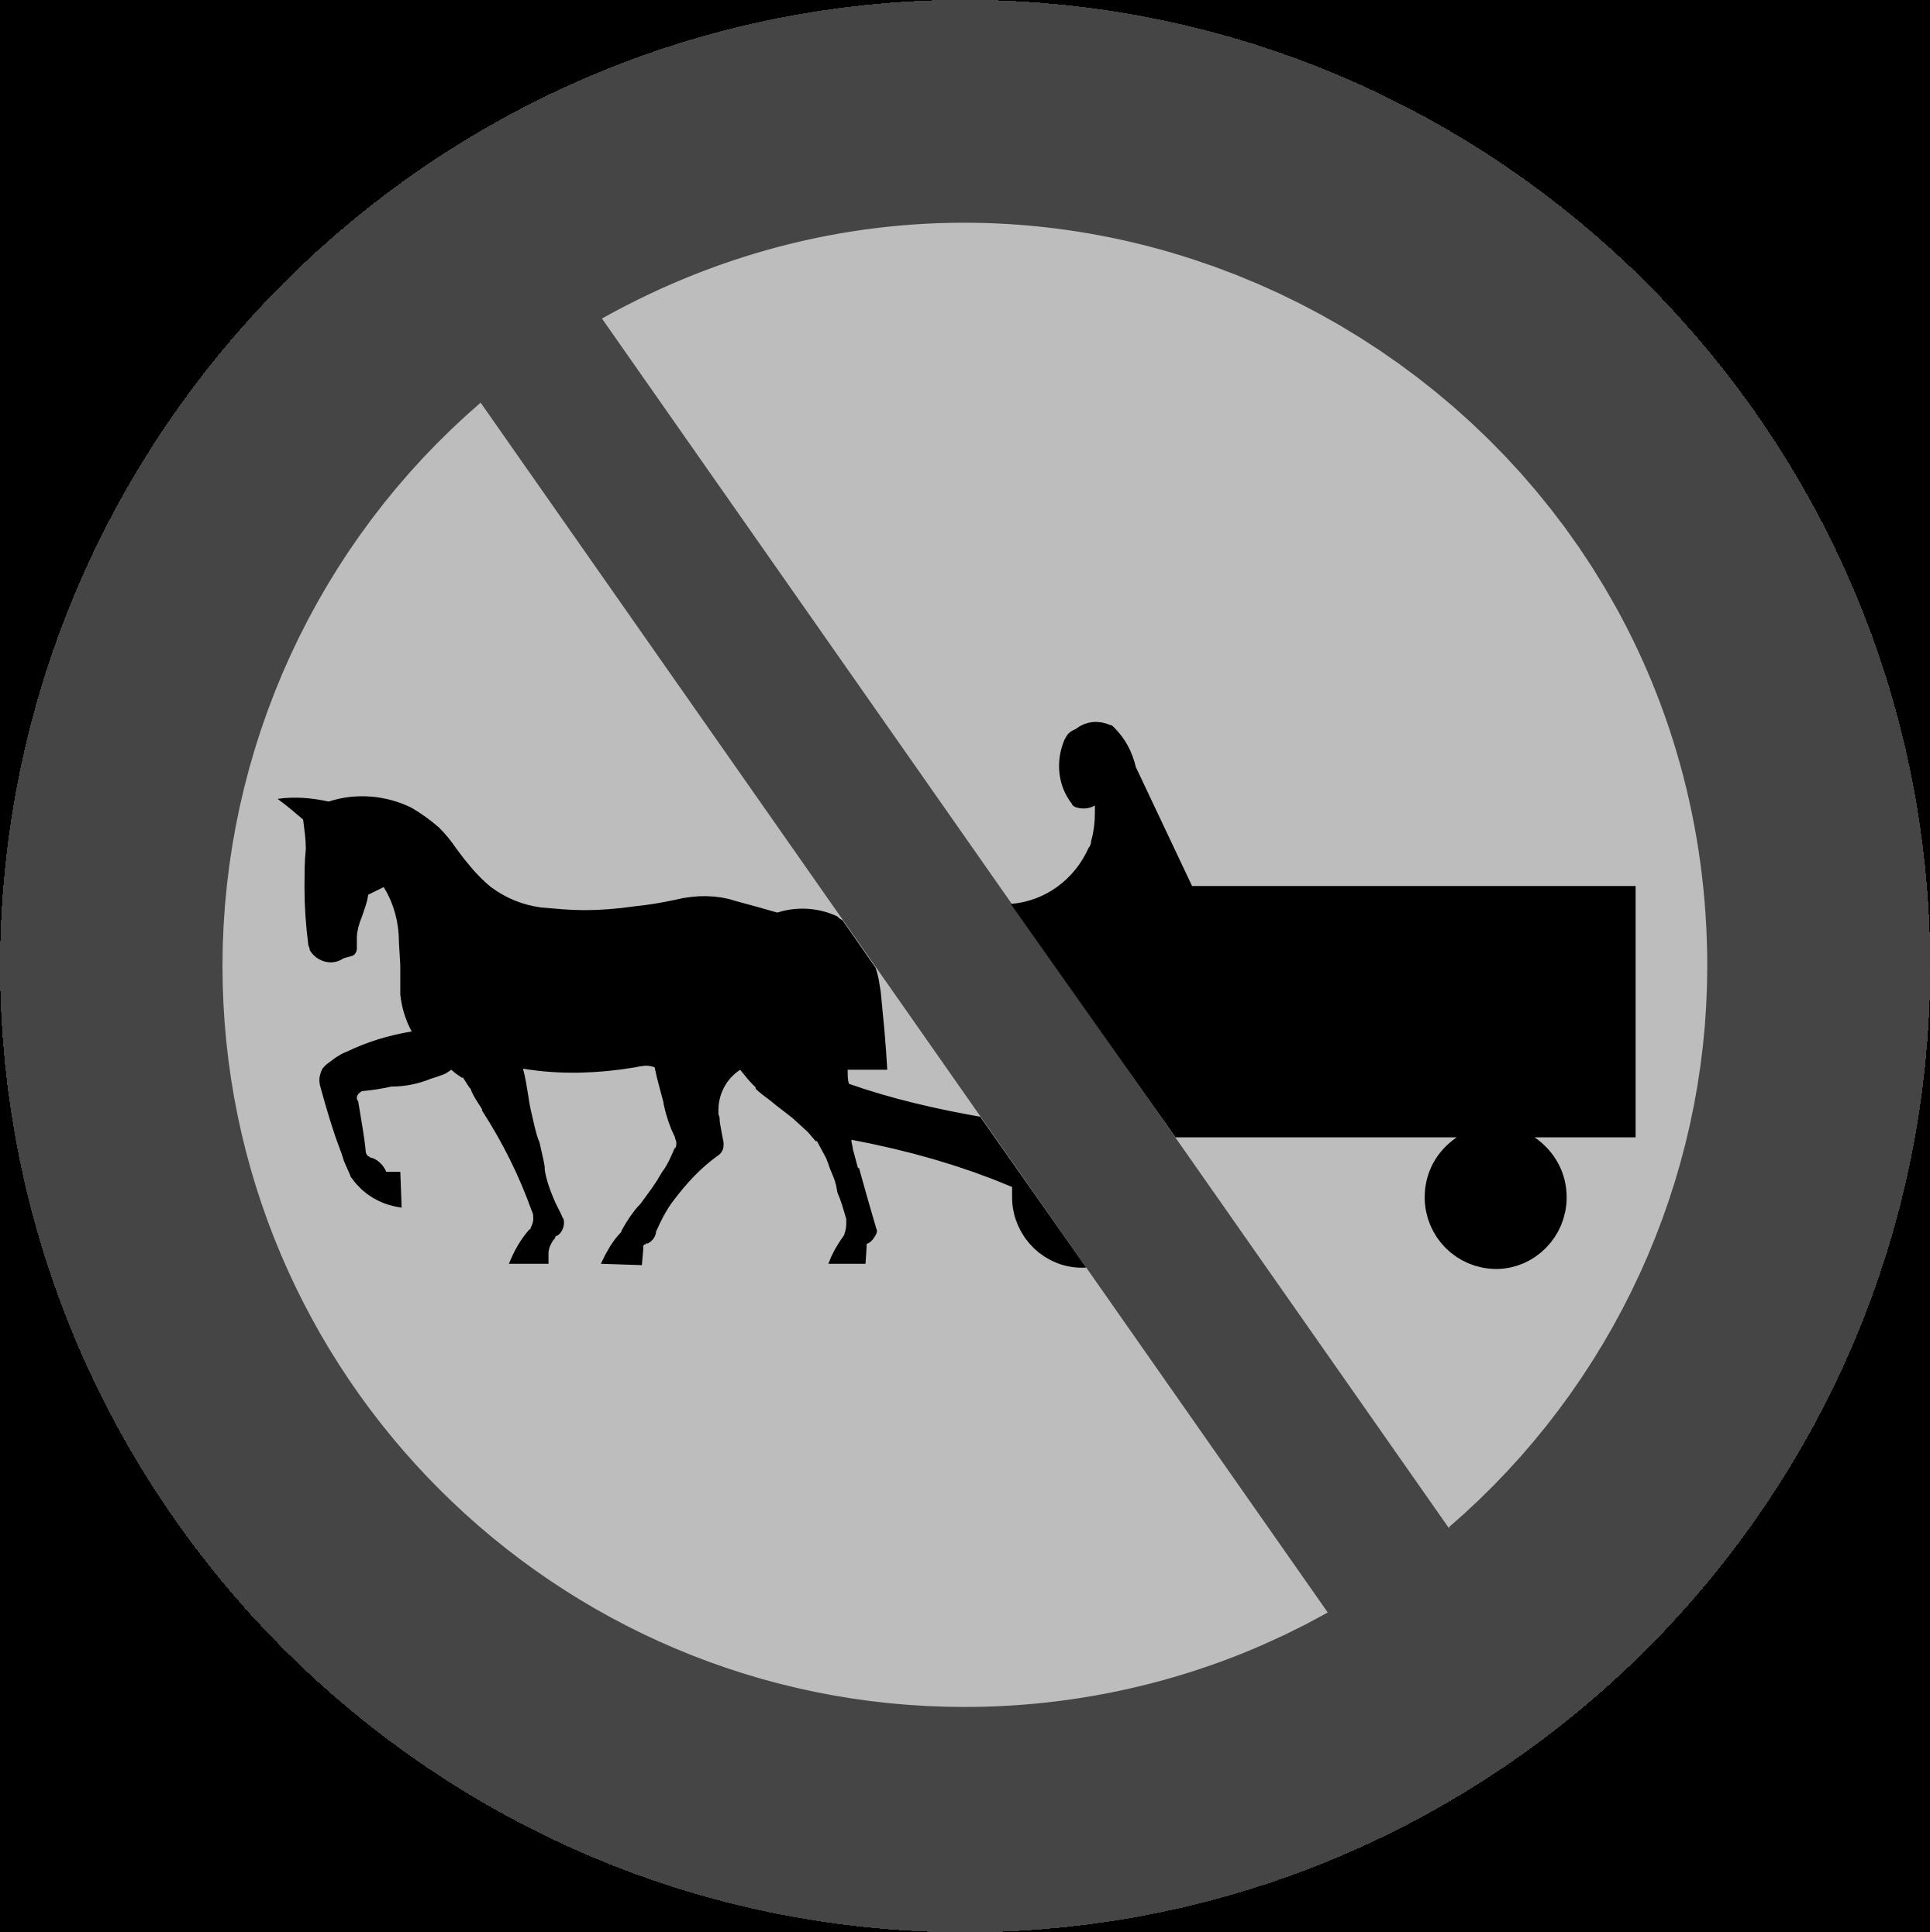 Horse clipart sign. Animal free black white